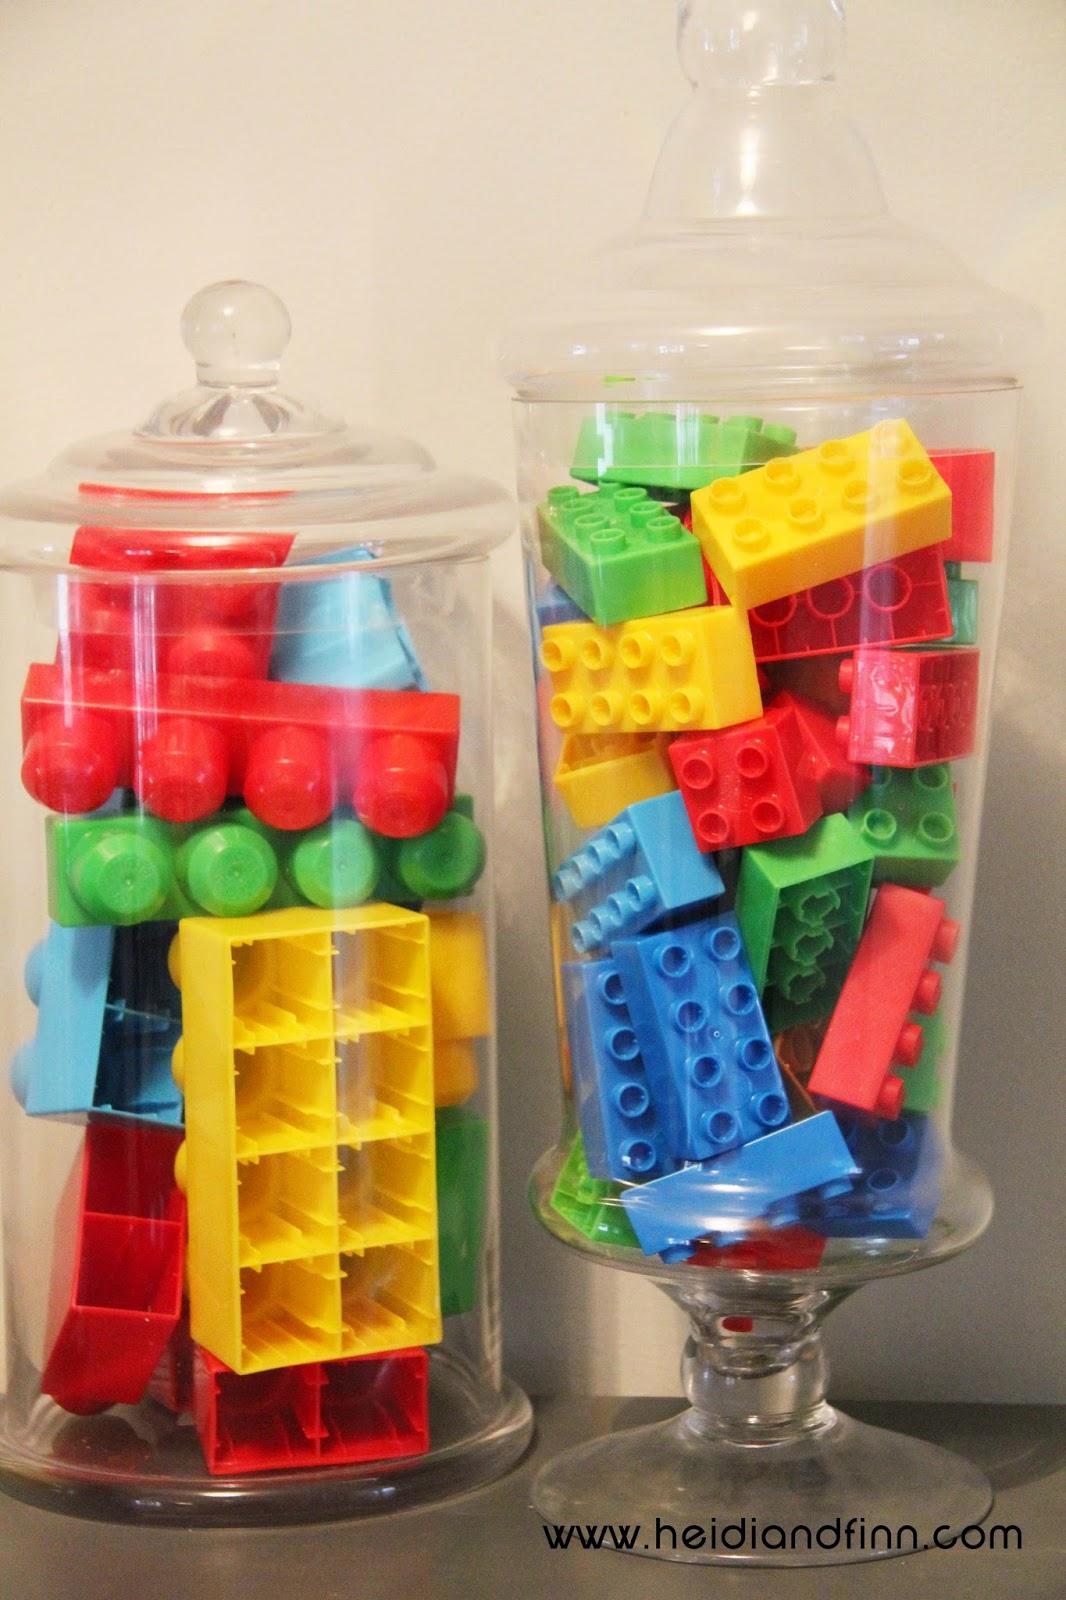 Heidiandfinn Modern Wears For Kids Lego Party Birthday